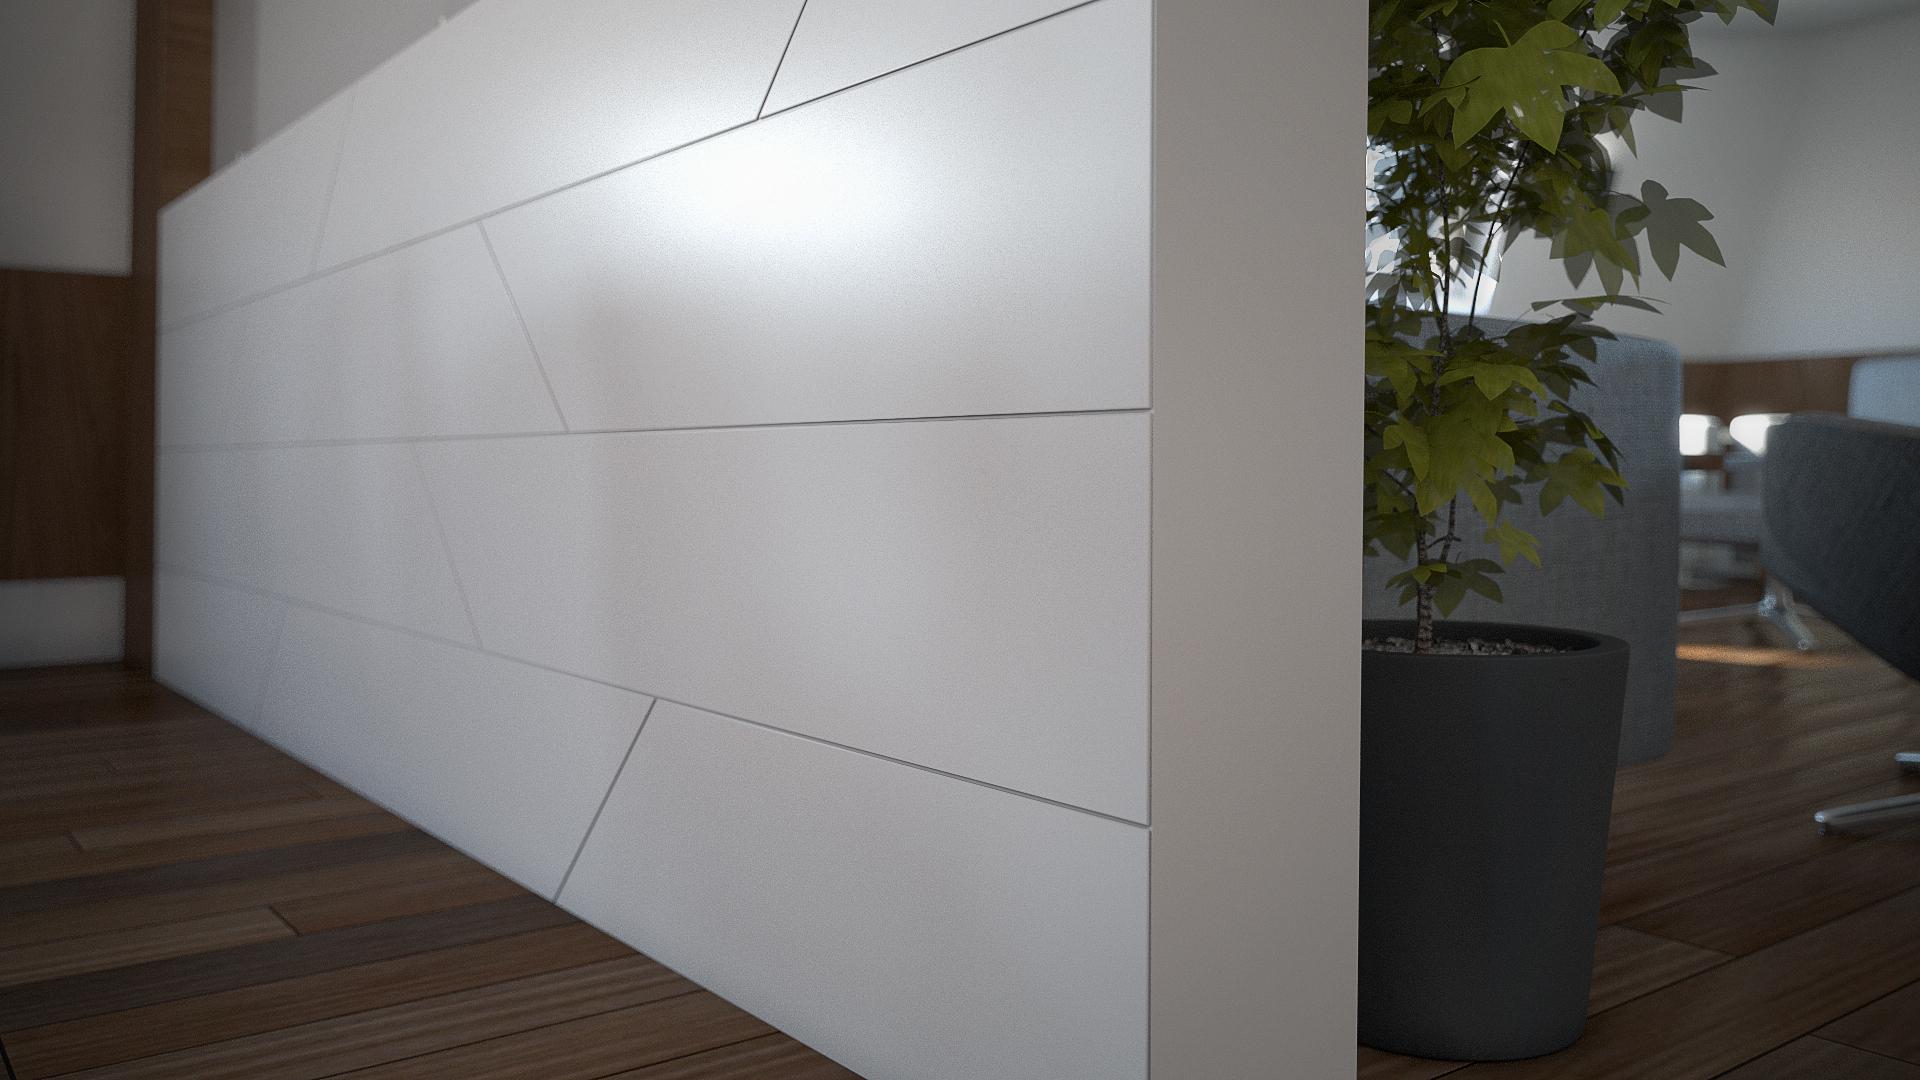 Detail - Wall devider